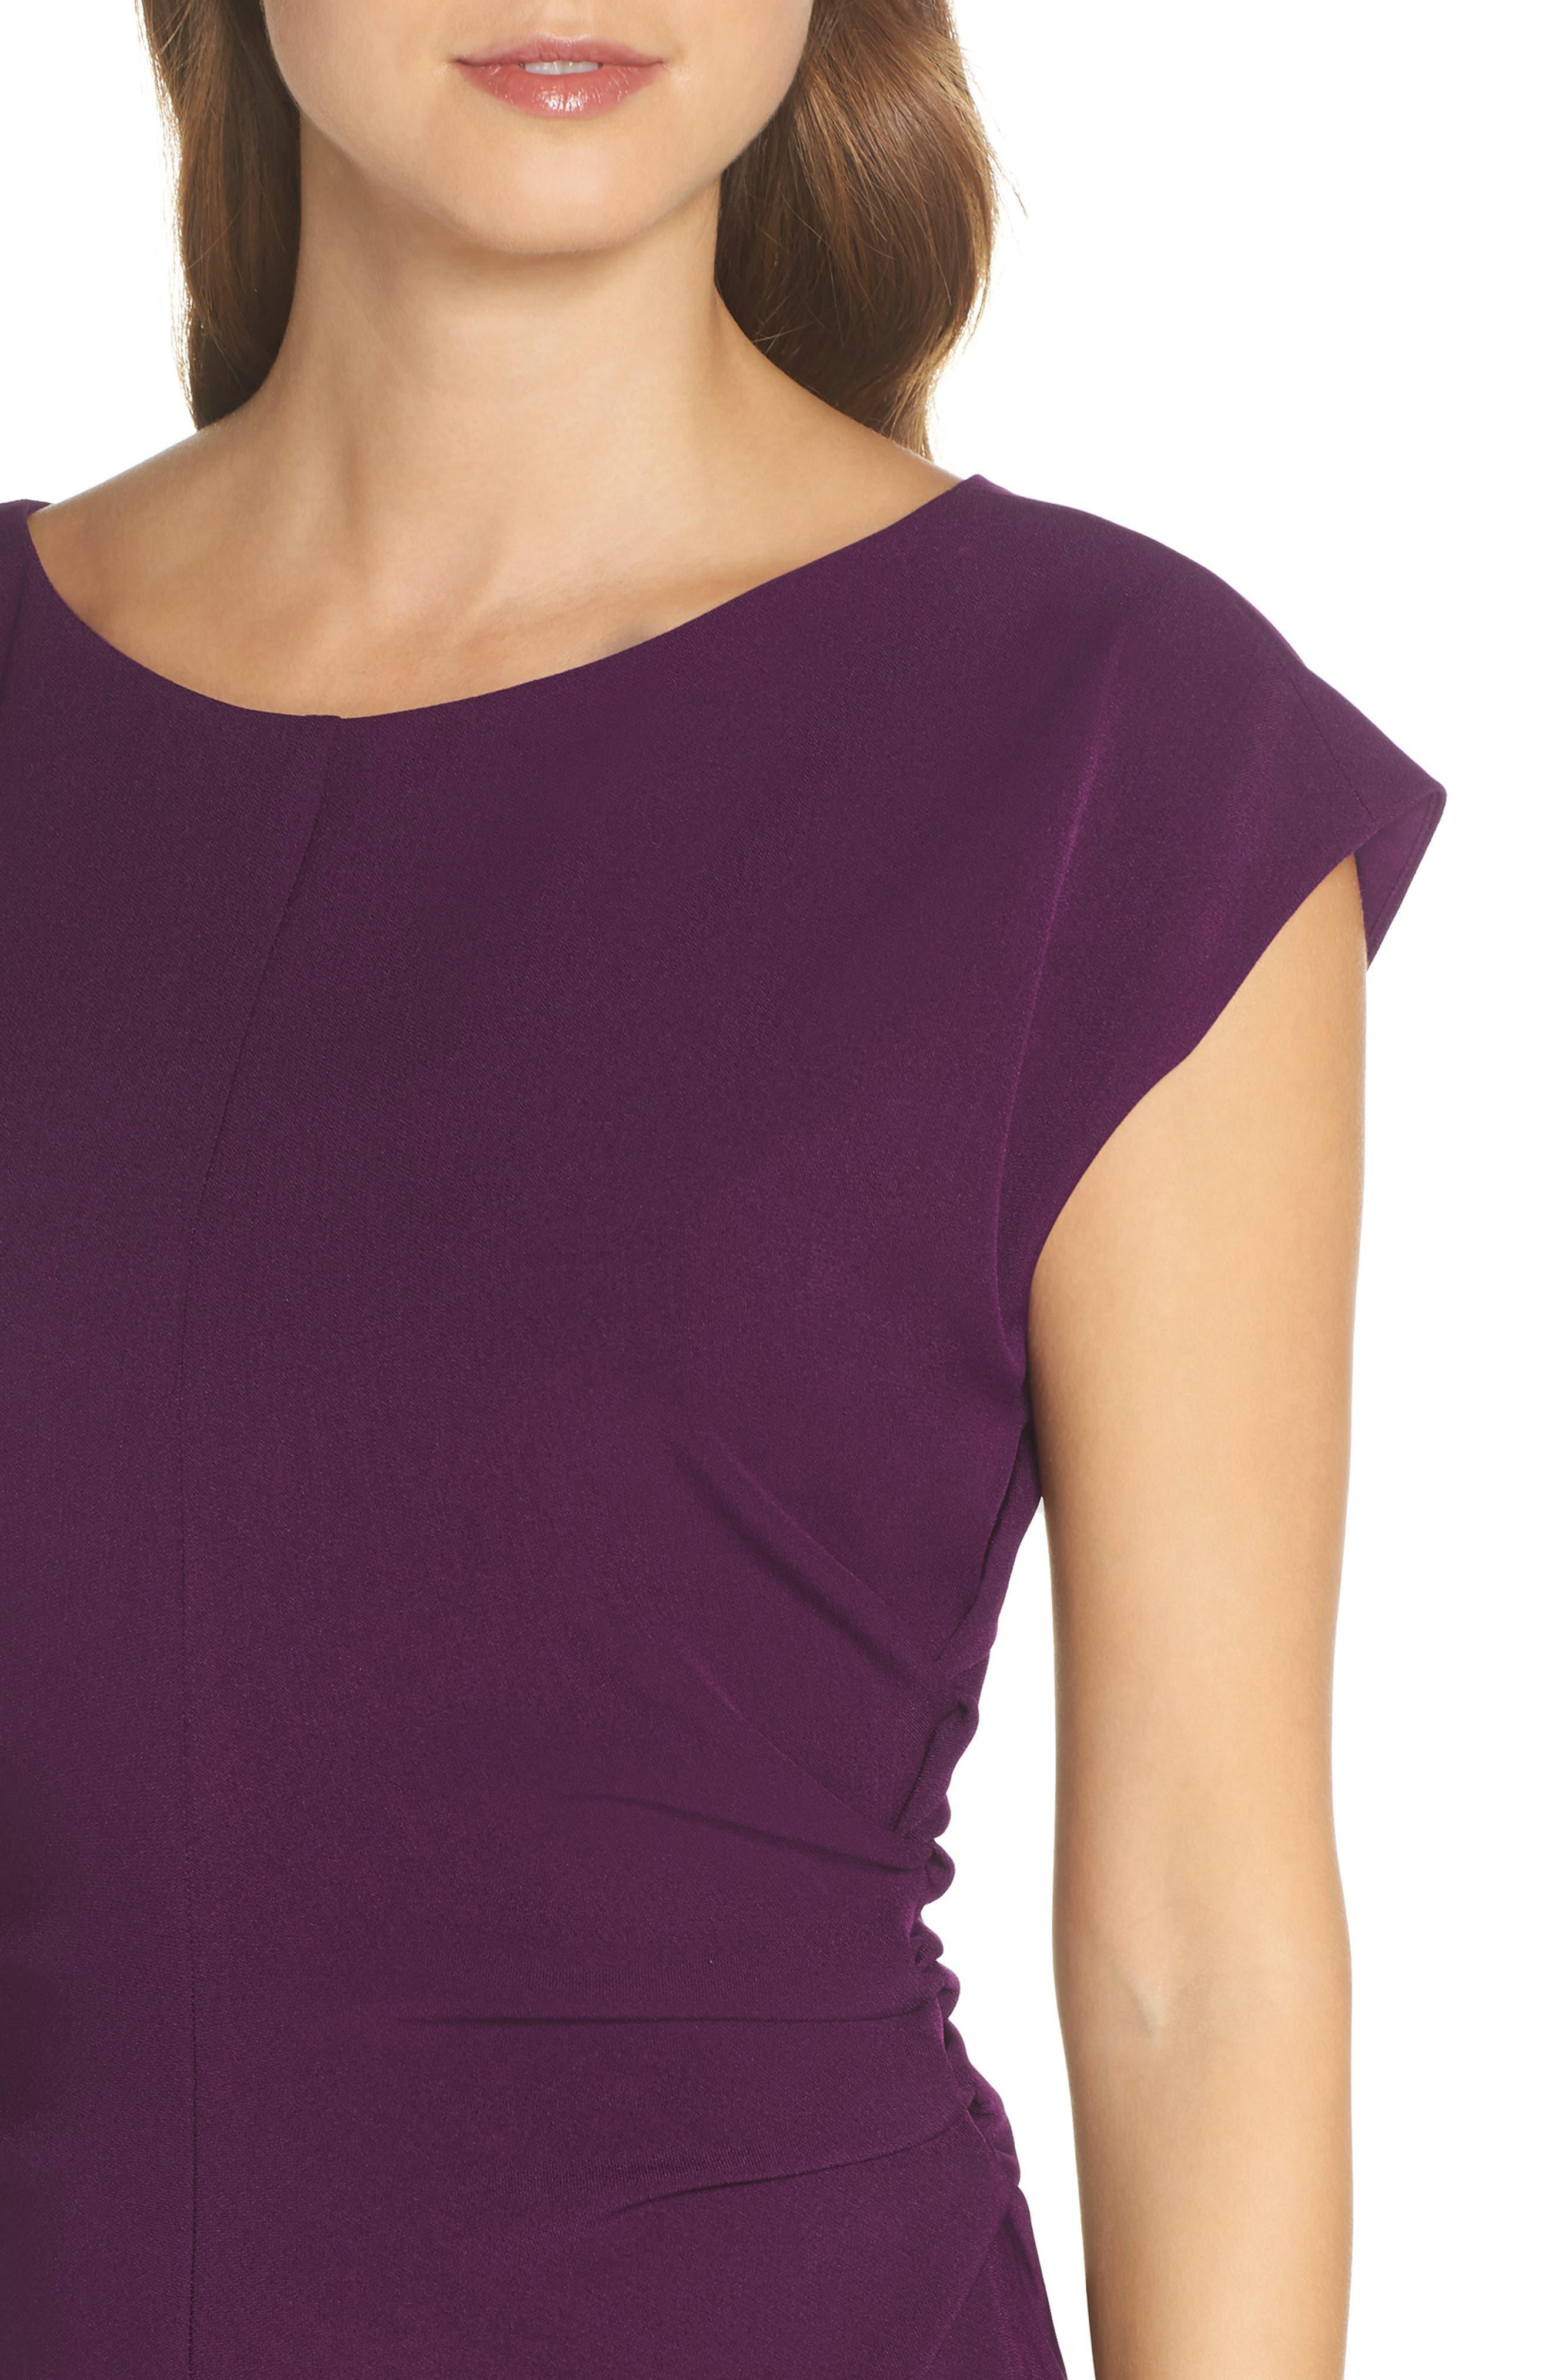 JULIA JORDAN,                             Ruched Stretch Crepe Fit & Flare Dress,                             Alternate thumbnail 4, color,                             PLUM